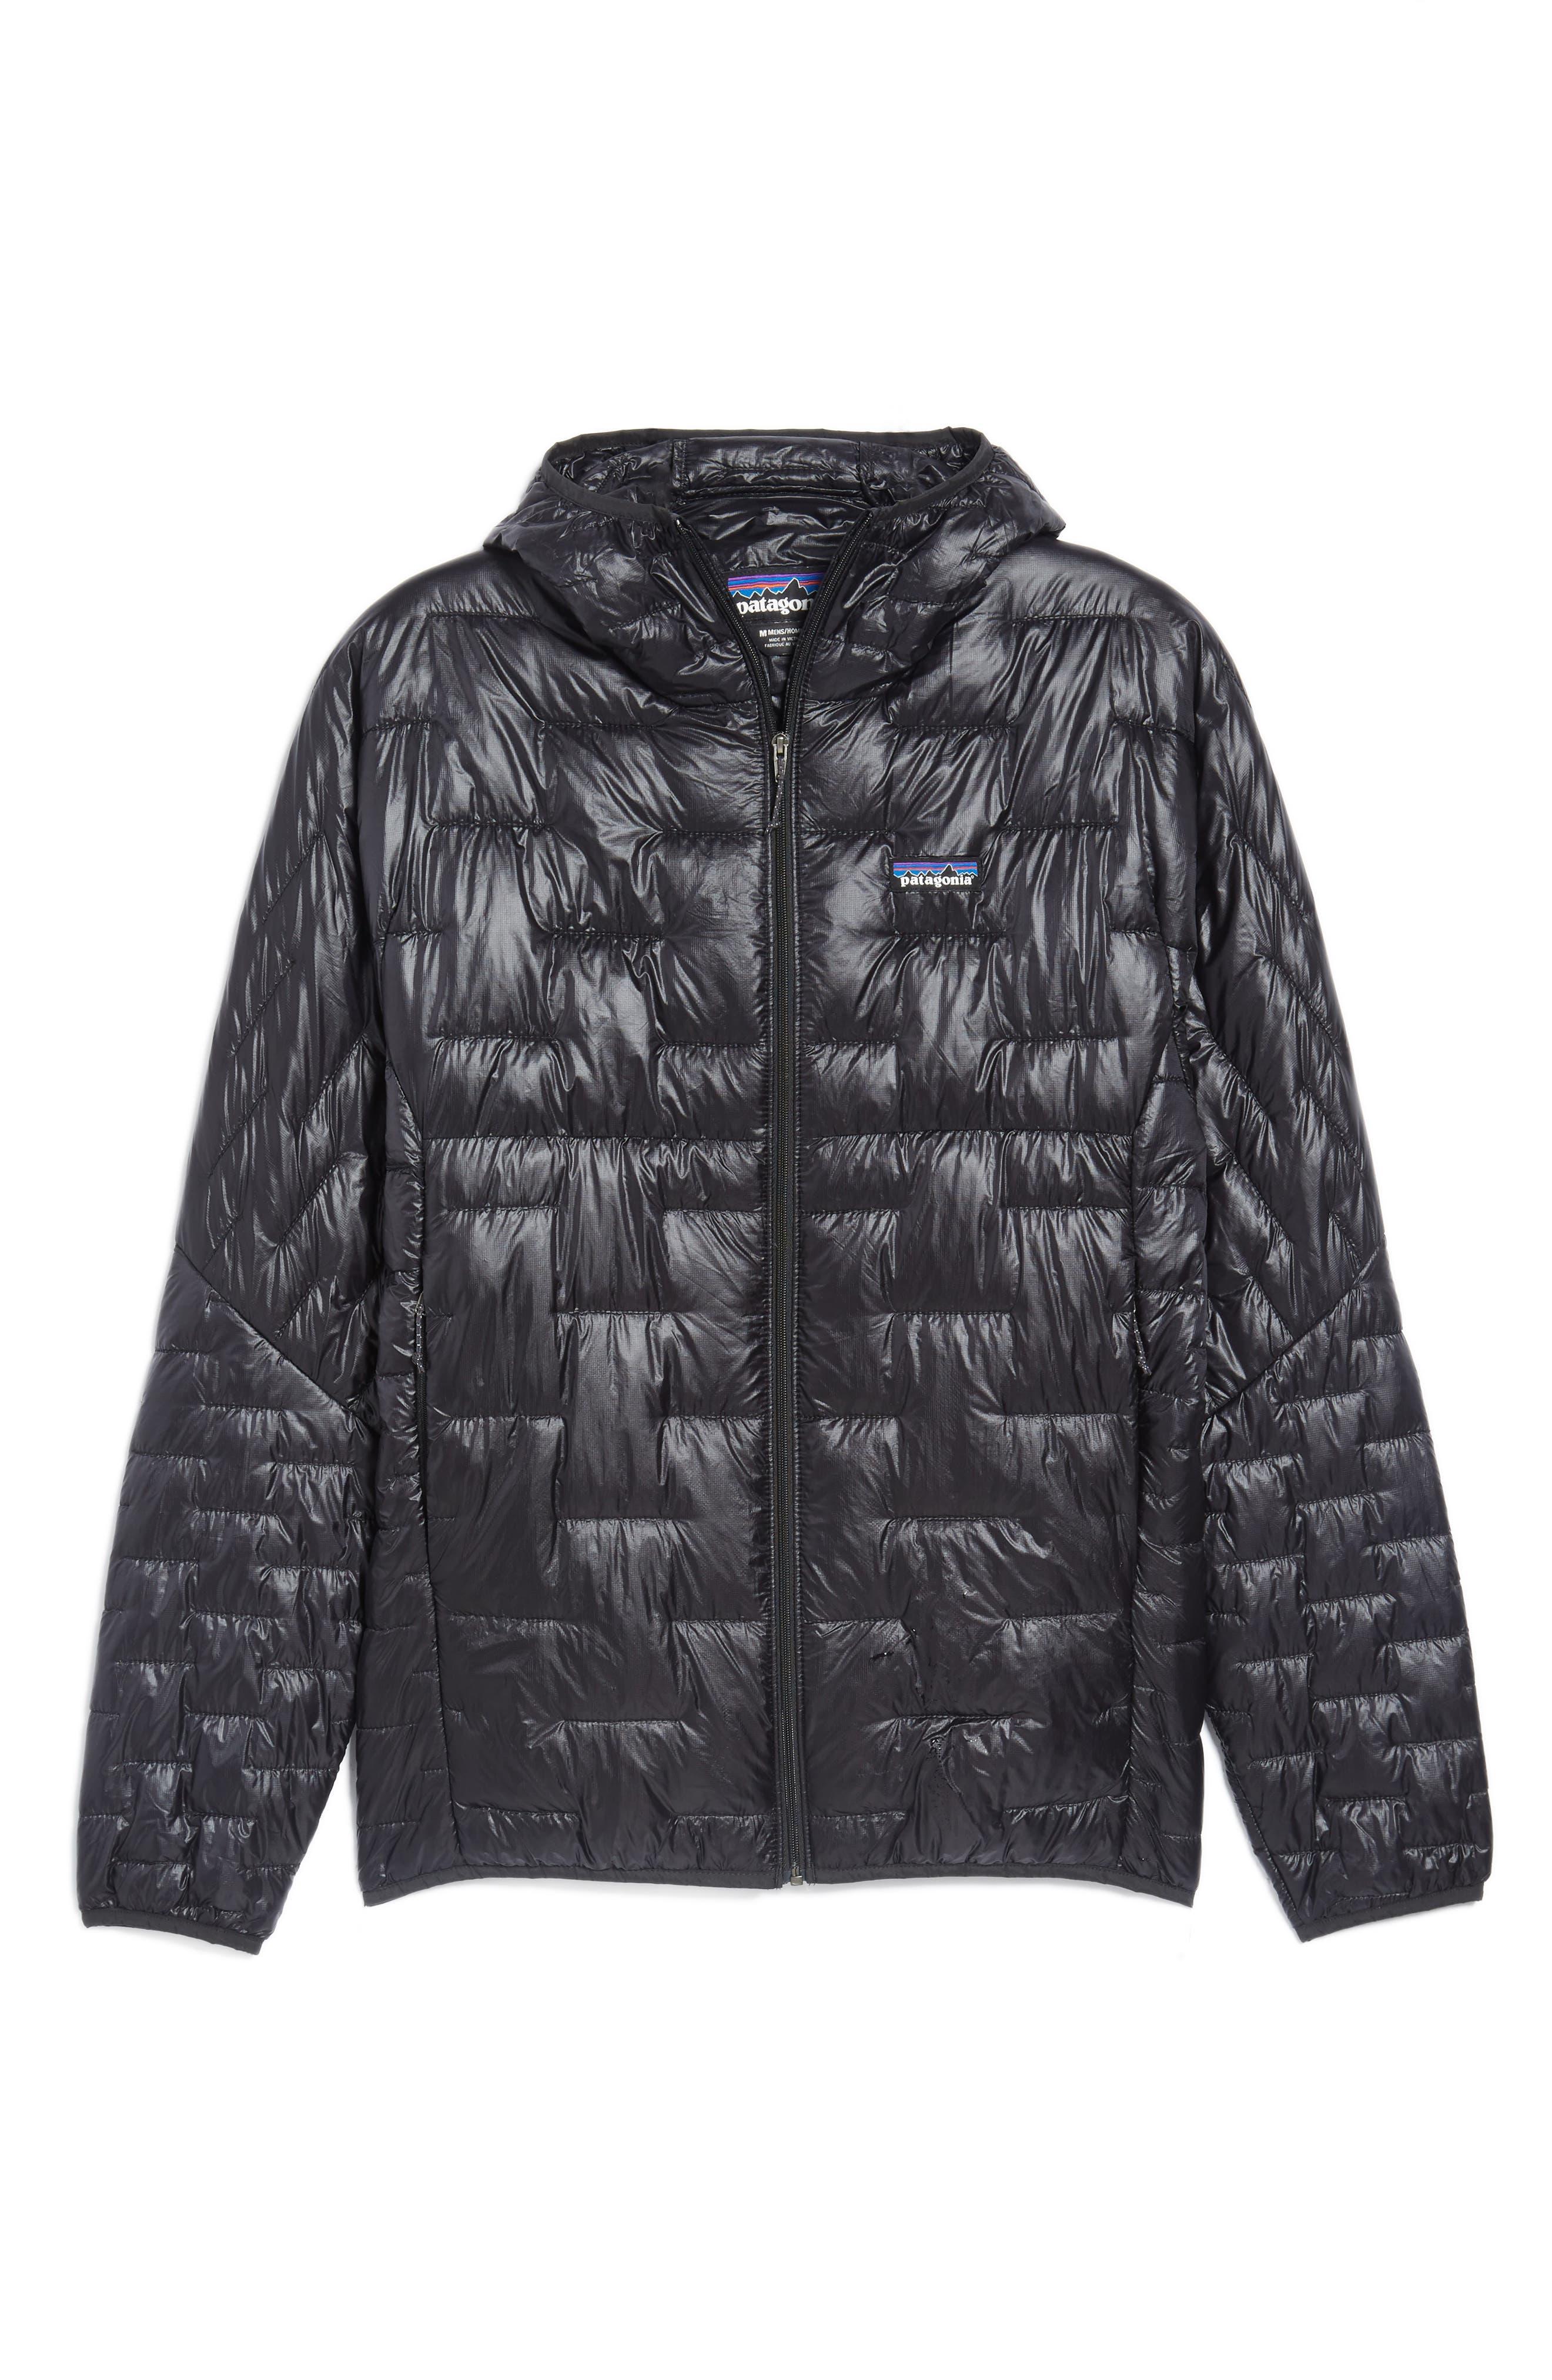 Micro Puff Jacket,                             Alternate thumbnail 5, color,                             BLACK